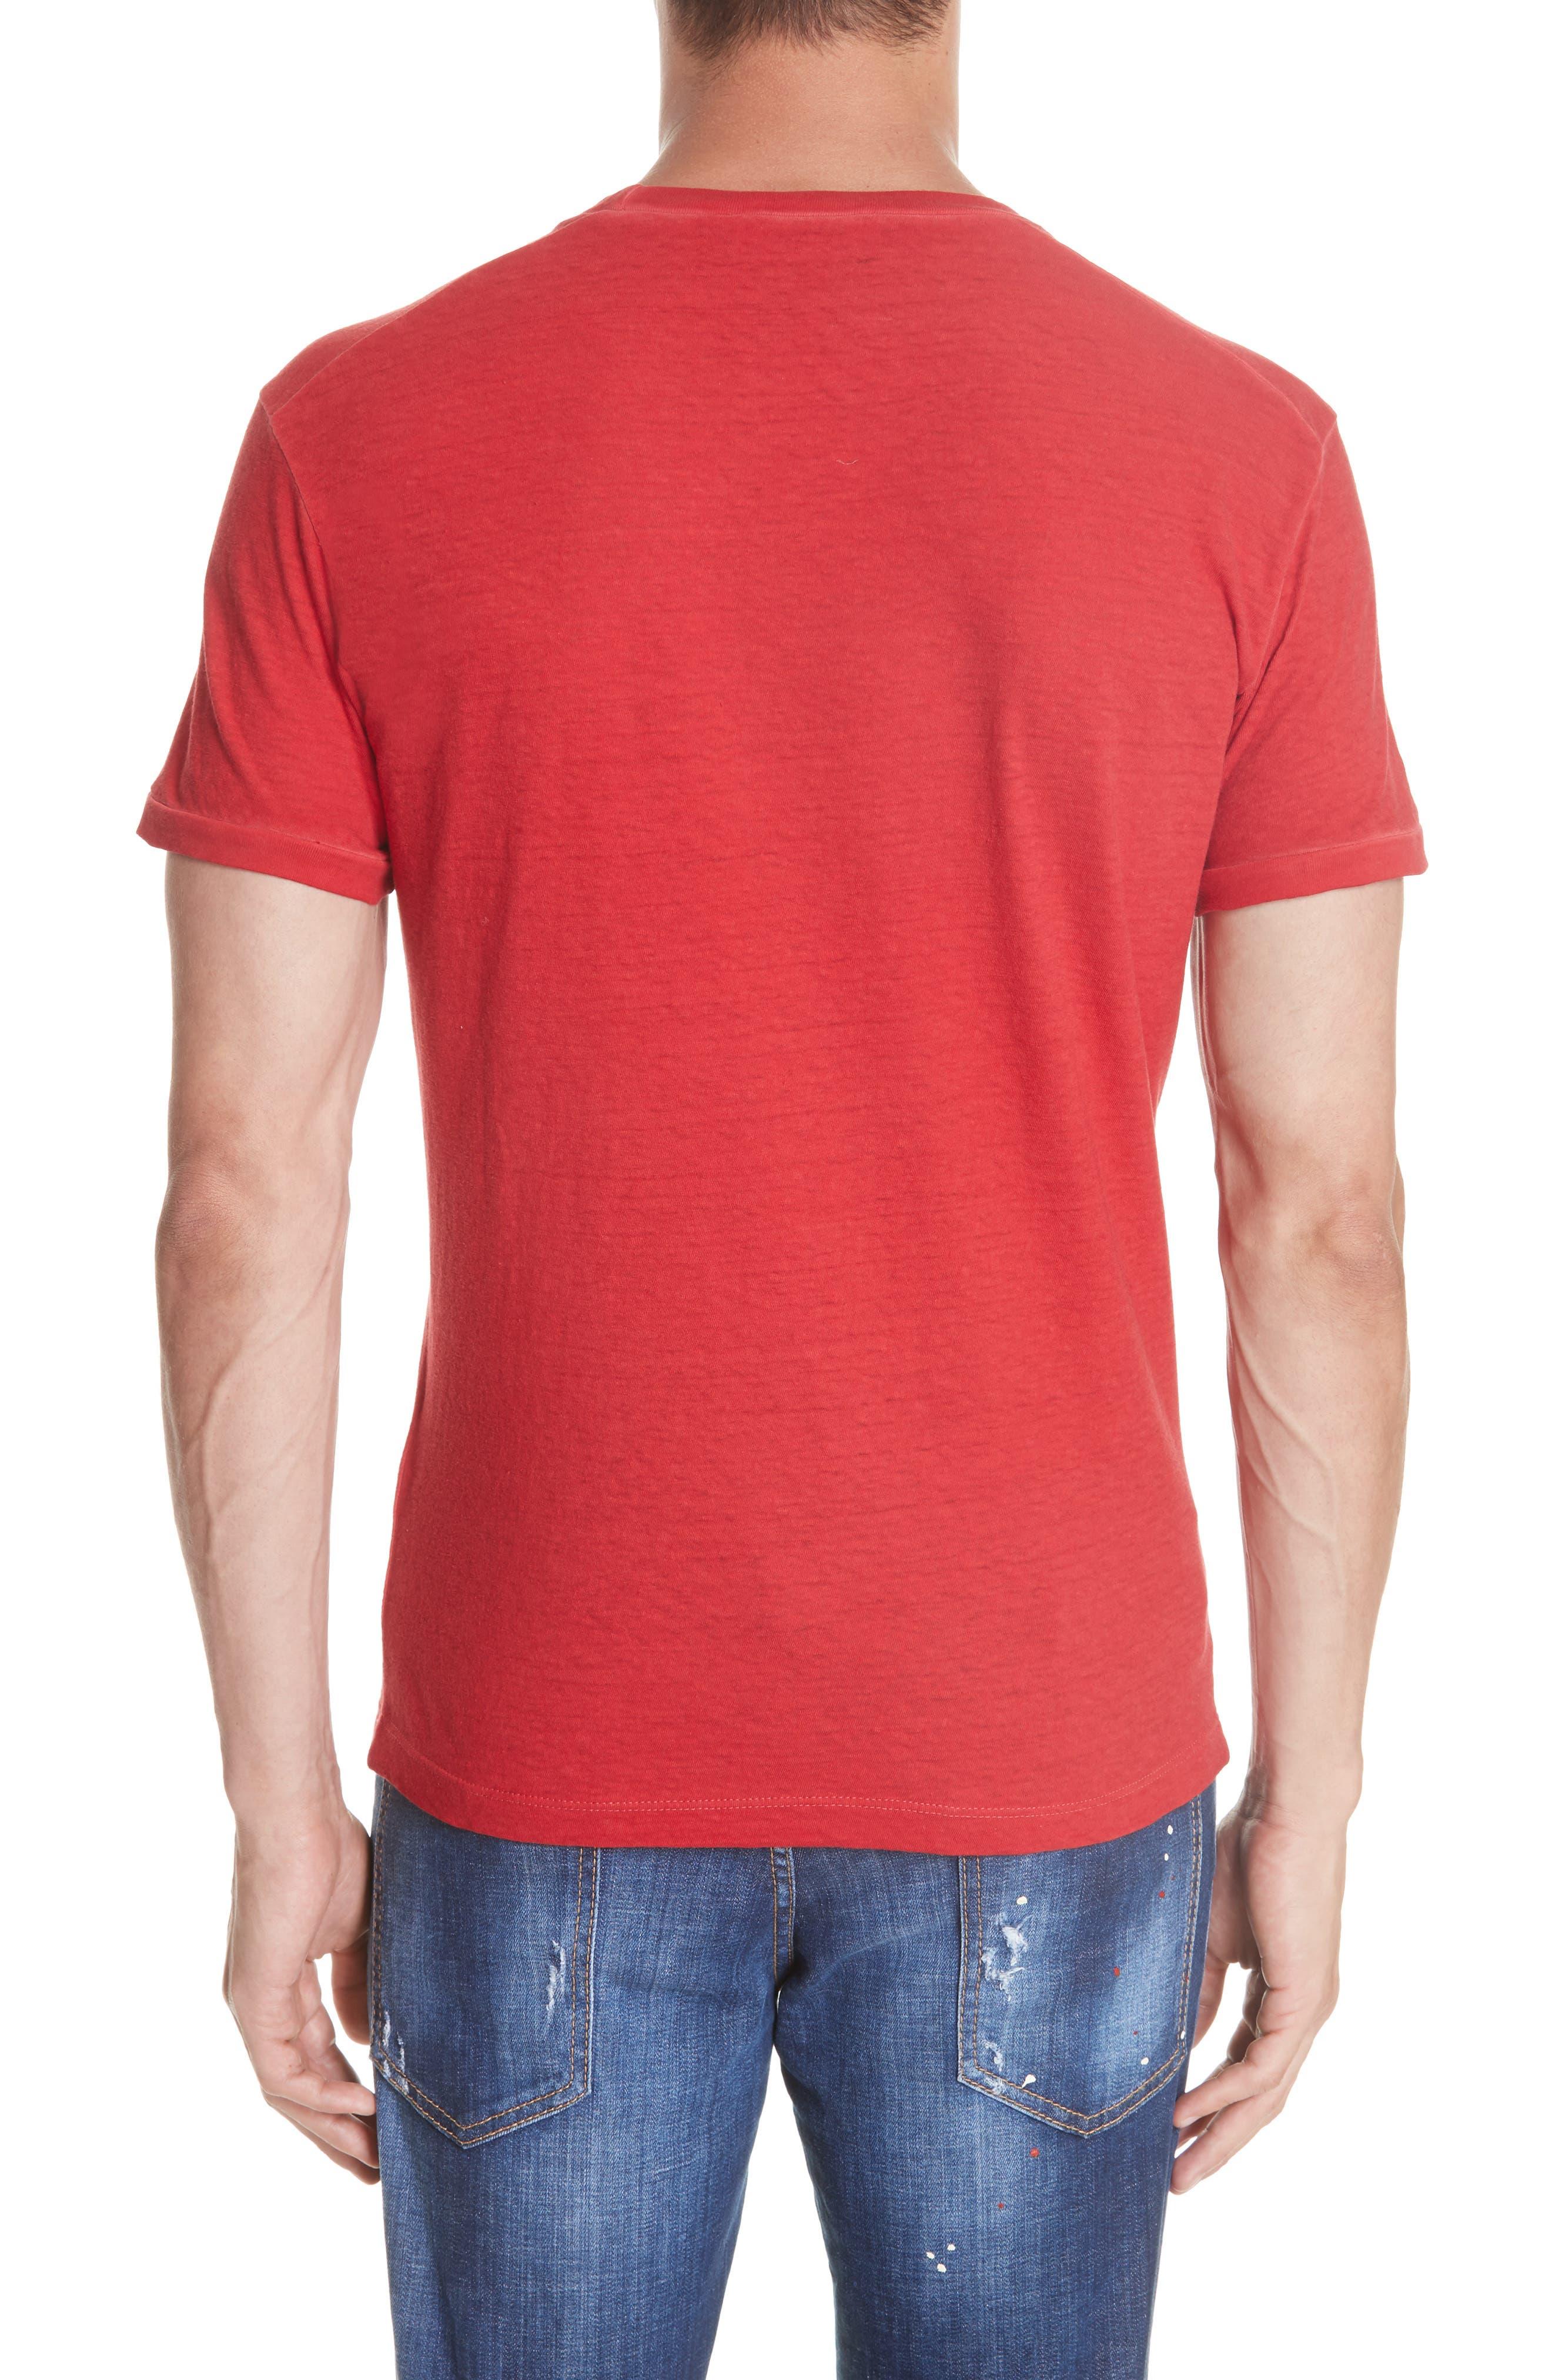 Boys Graphic T-Shirt,                             Alternate thumbnail 2, color,                             600